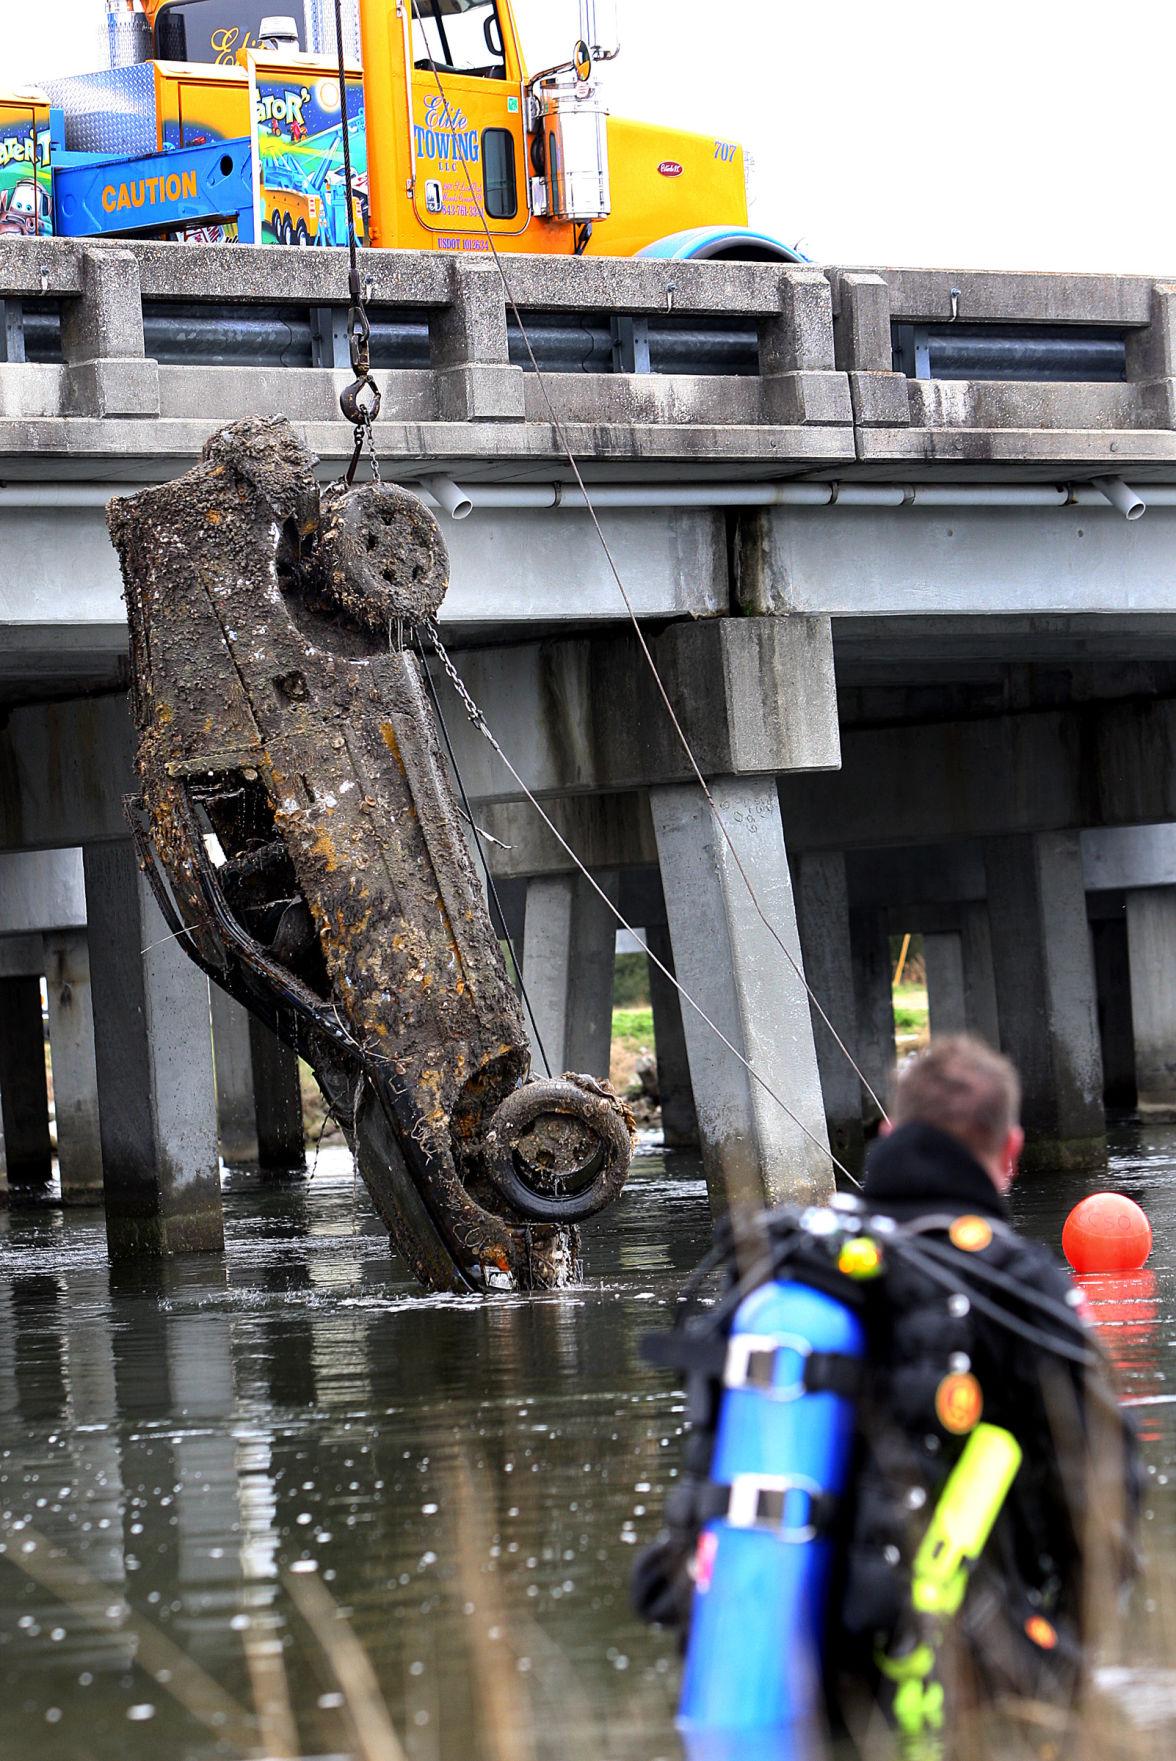 Two, not three, cars were in creek, deputies say